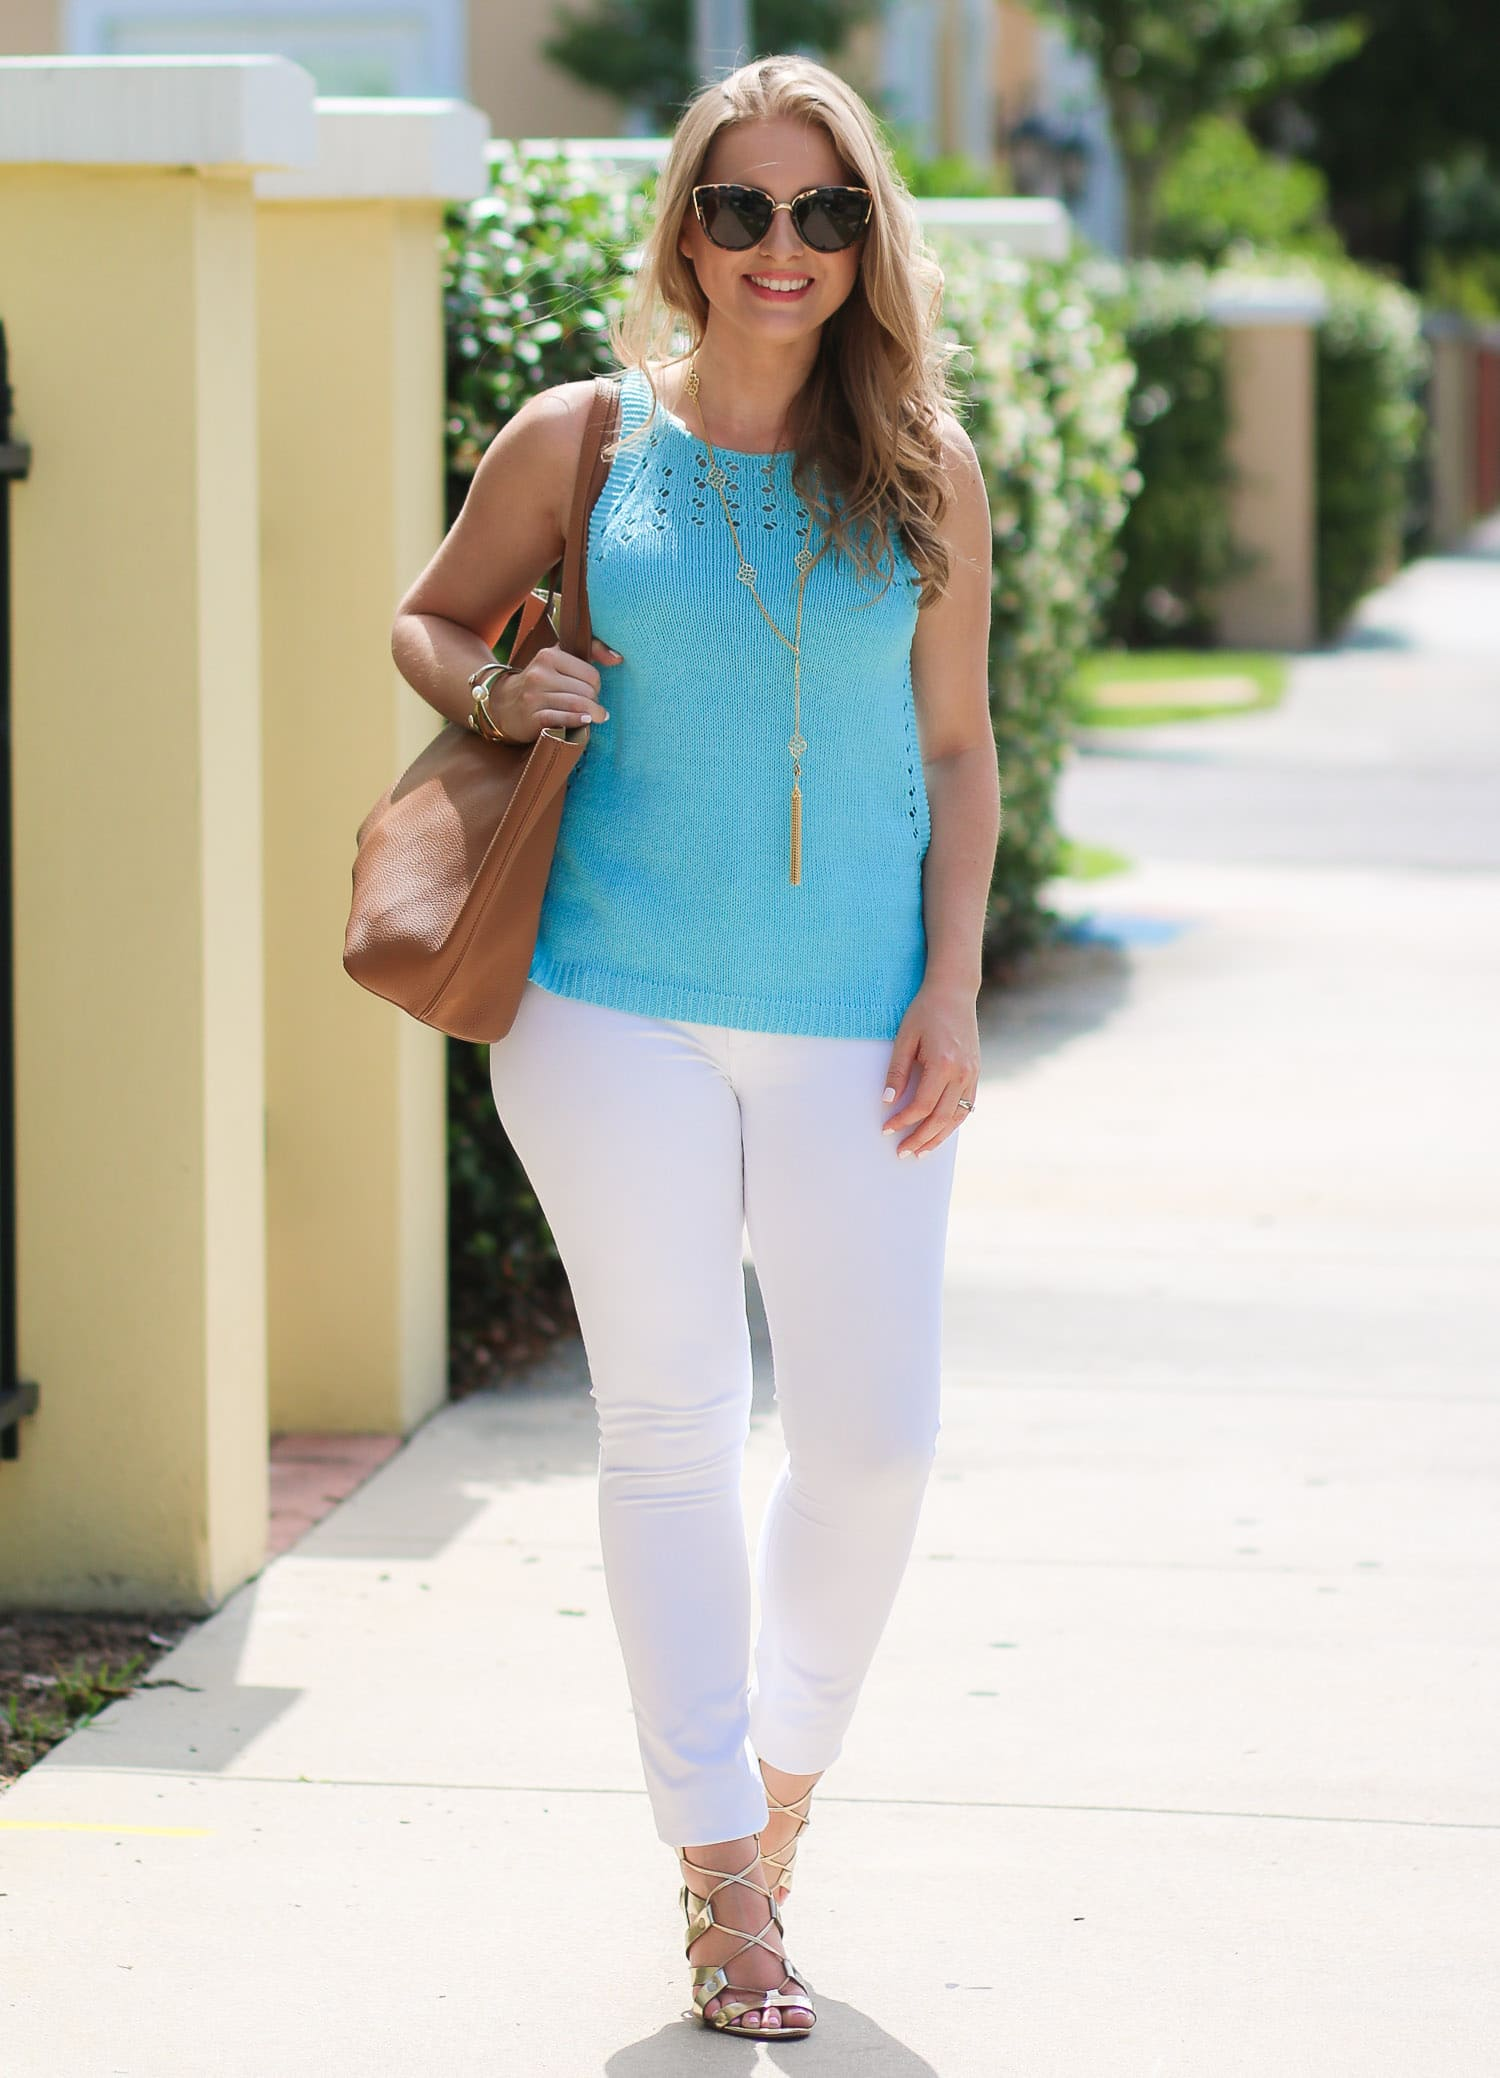 Lilly-Pulitzer-Mac-Sweater-Tank-Breakwater-Blue-Banana-republic-gold-lace-up-heels-fashion-blogger-ashley-brooke-nicholas-2972